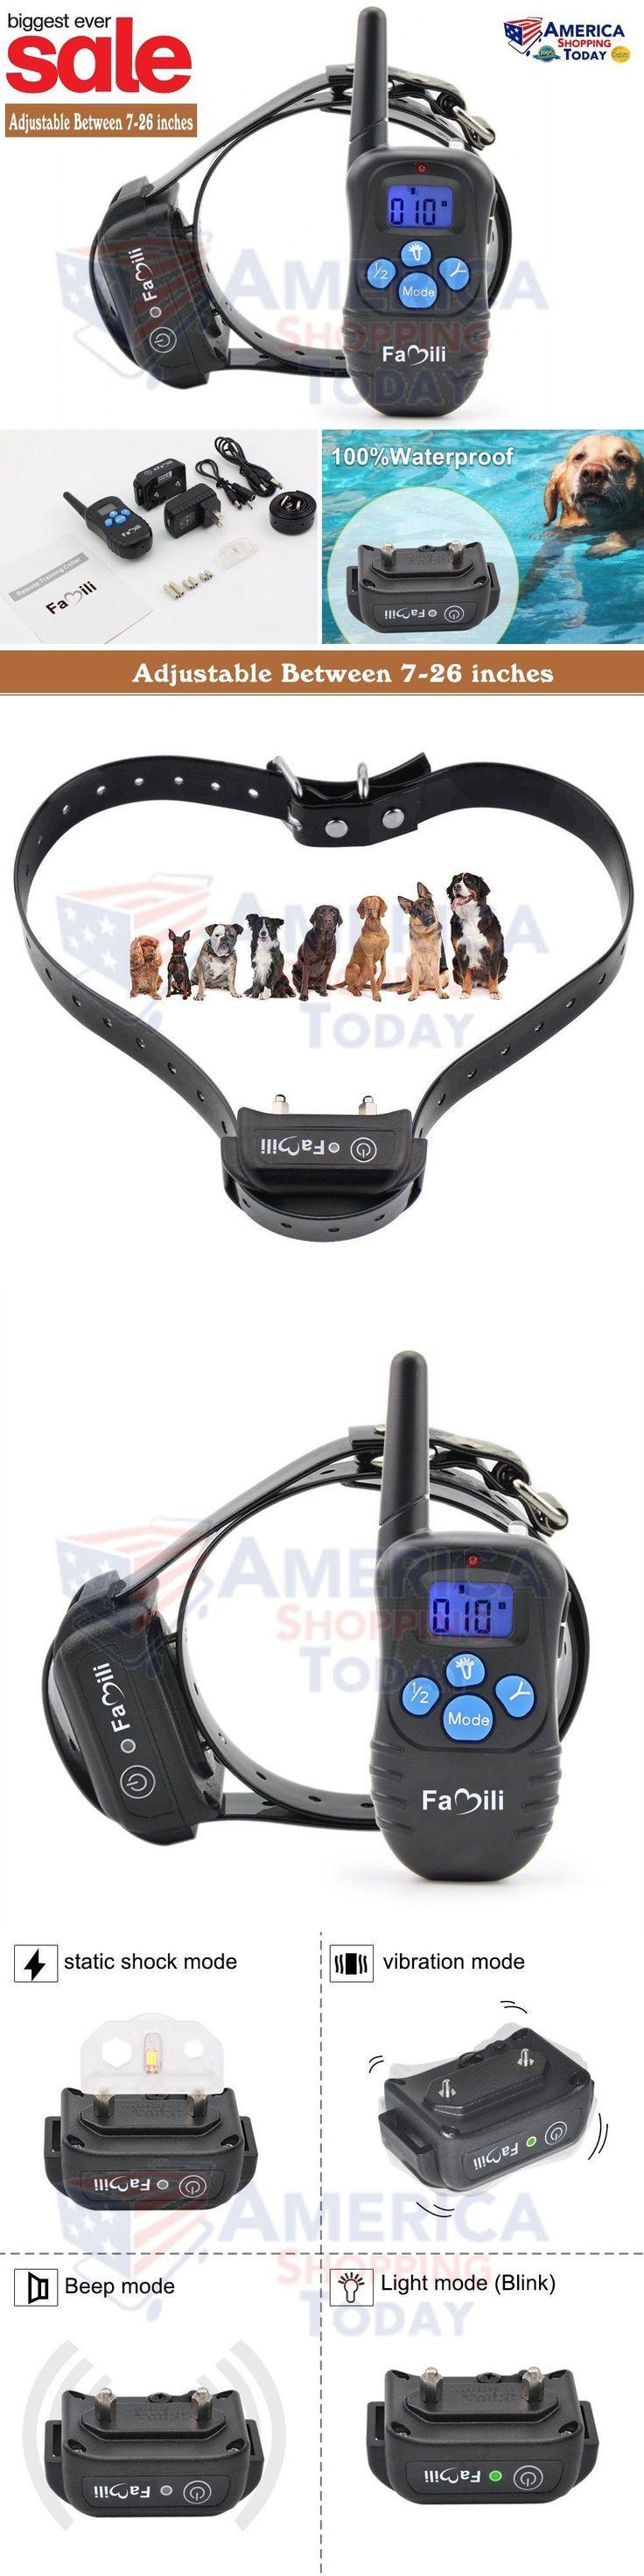 Bark Collars 66774: Sportdog Shock Collar Dog Training Collars Waterproof Remote Free Usa Shipping! -> BUY IT NOW ONLY: $35.24 on eBay!